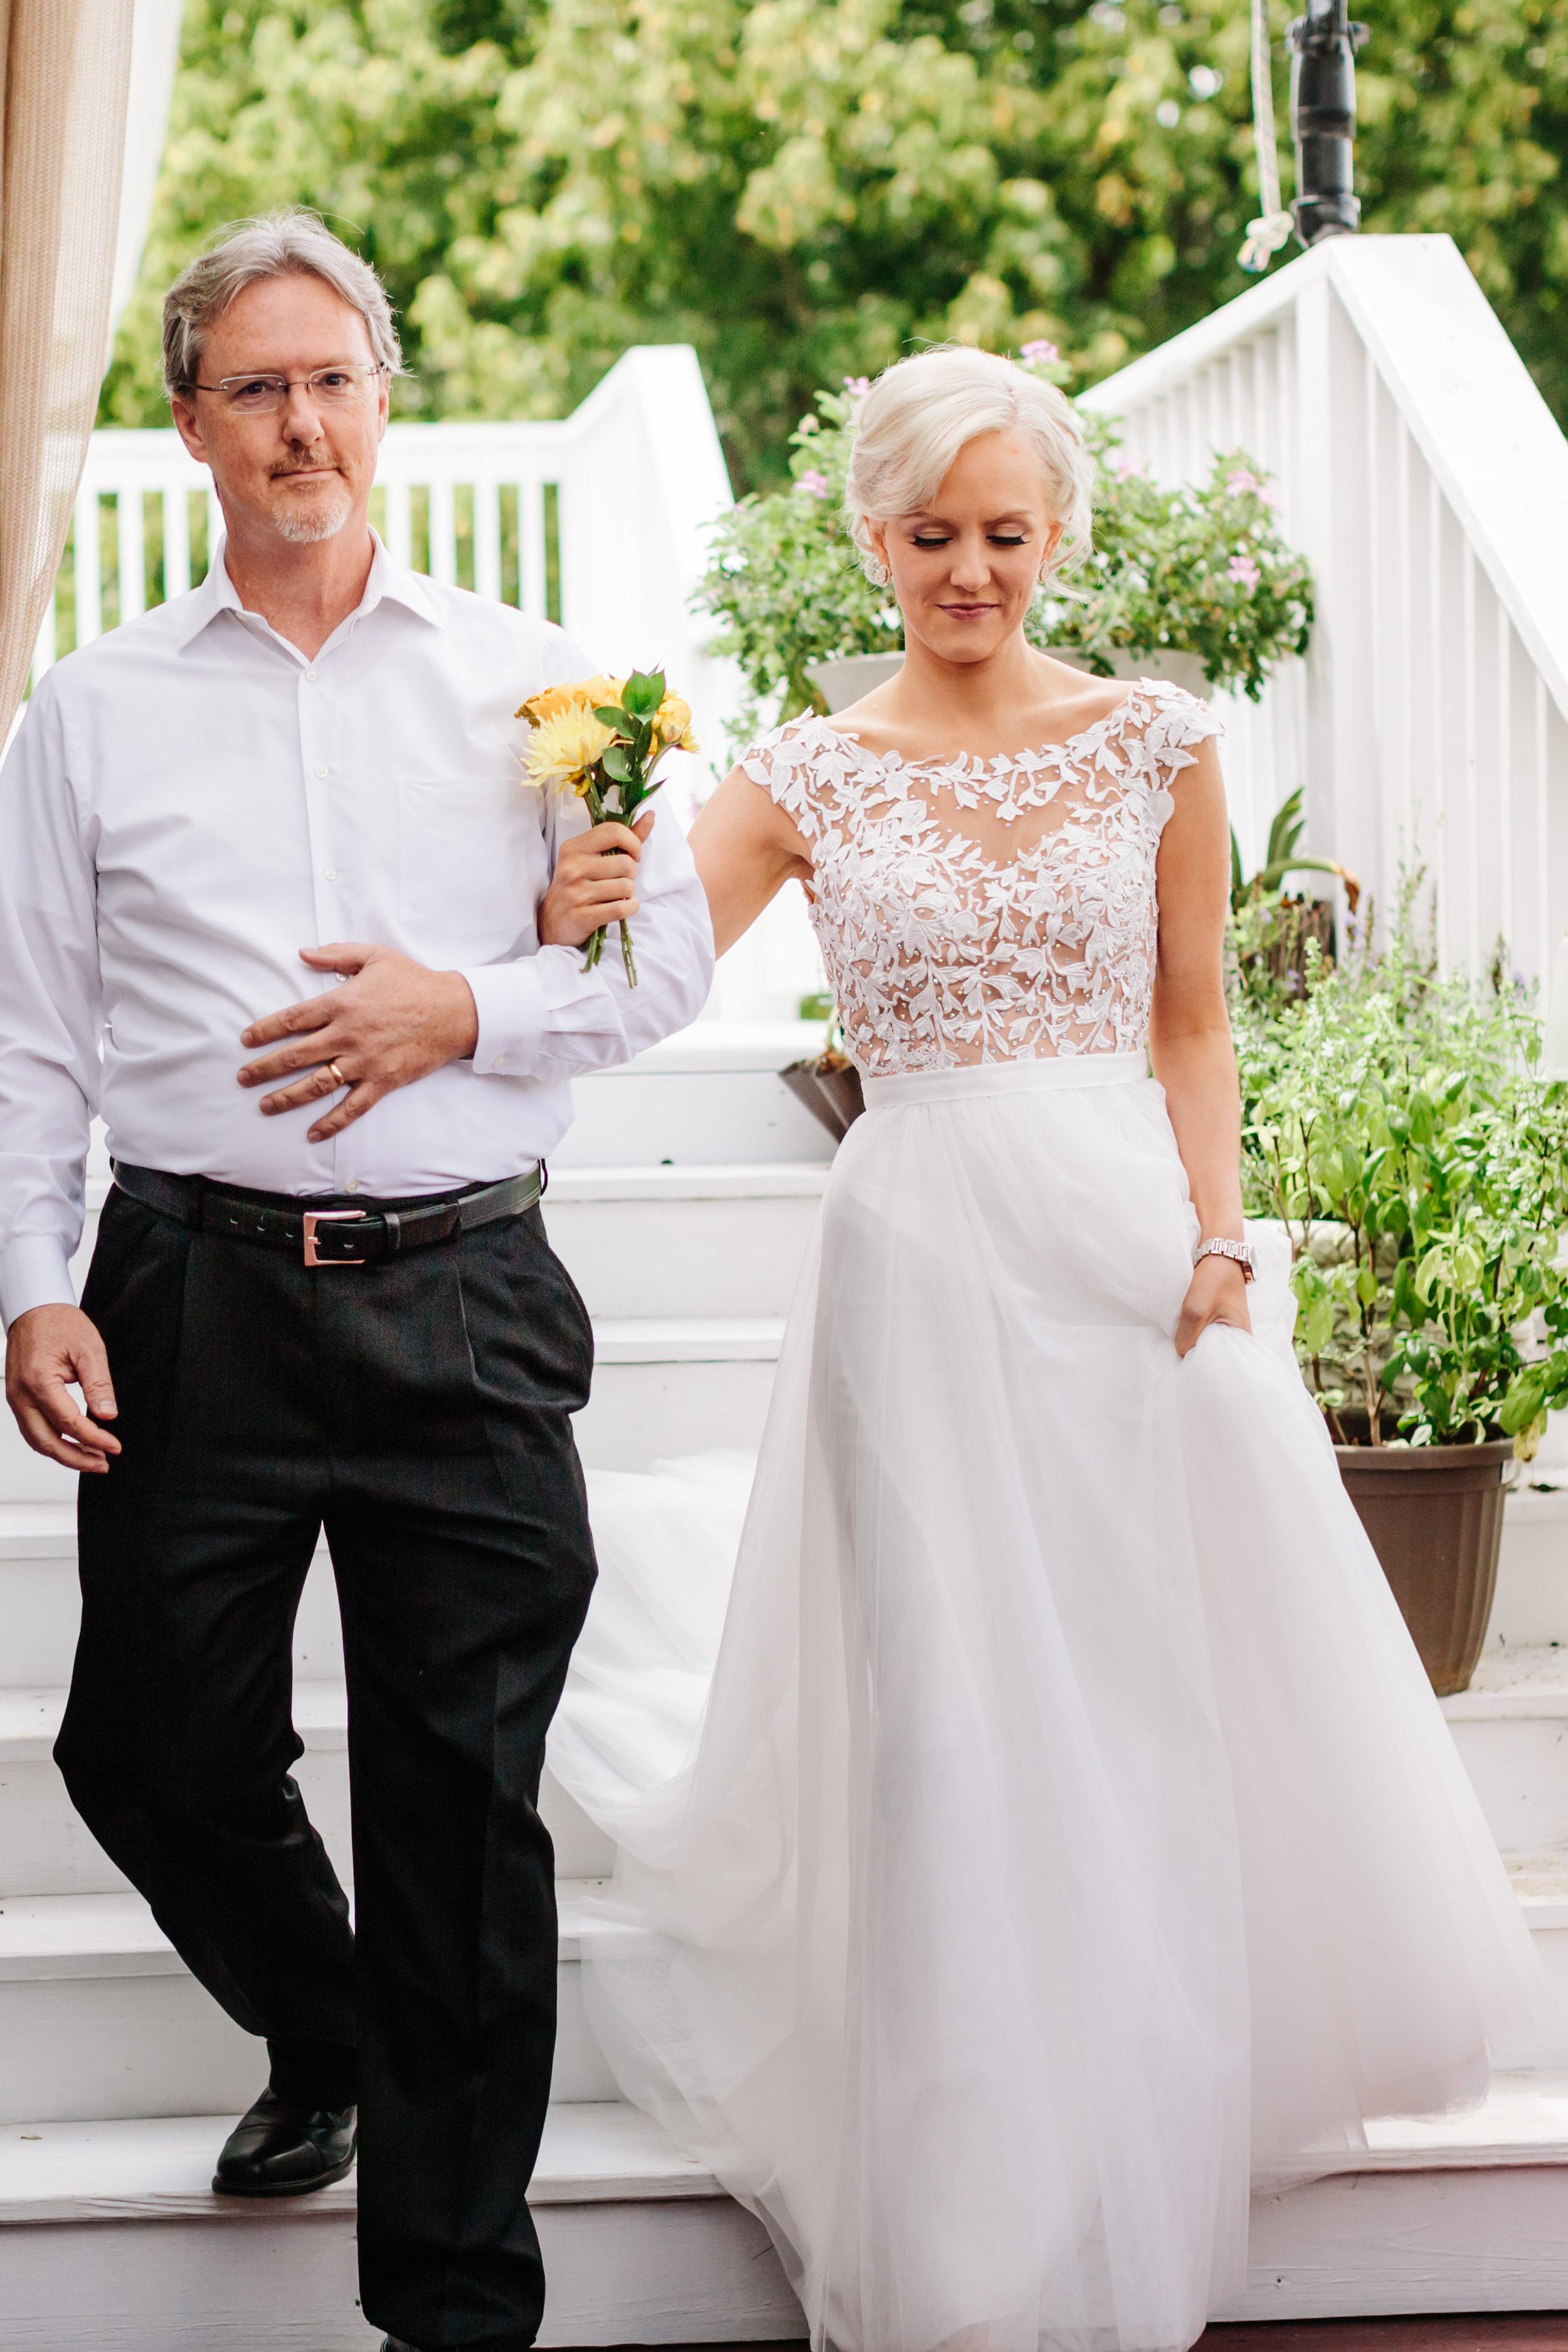 2018.09.02 Ray and Sarah Prizner Nashville TN Wedding FINALS-230.jpg